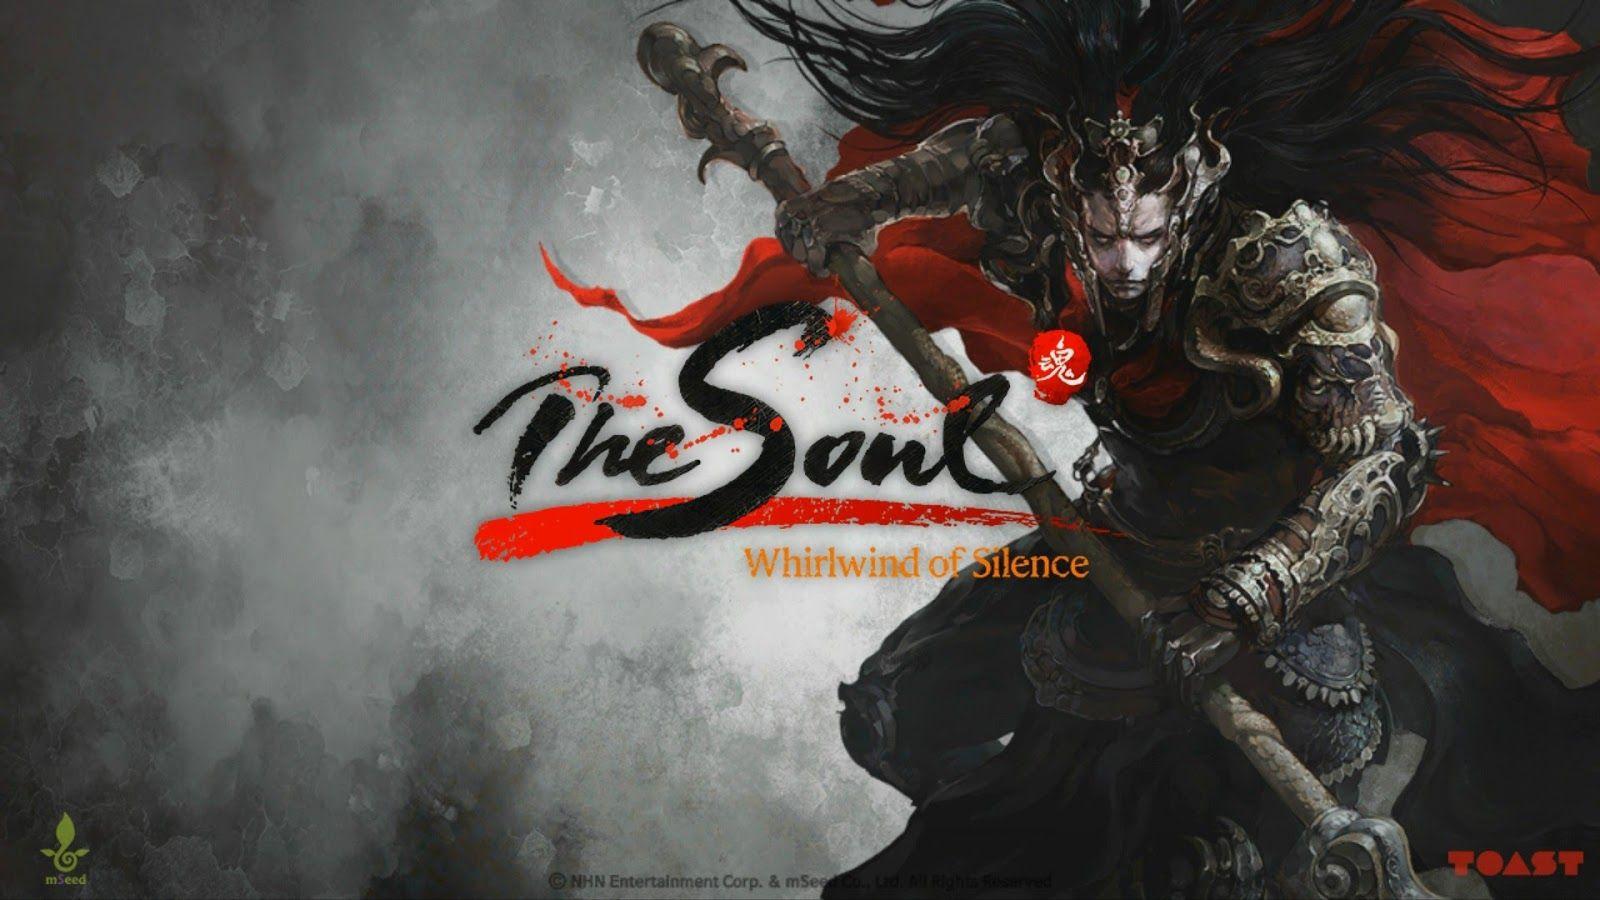 Download The Soul Mod God Mode Apk Terbaru Game Android Mod